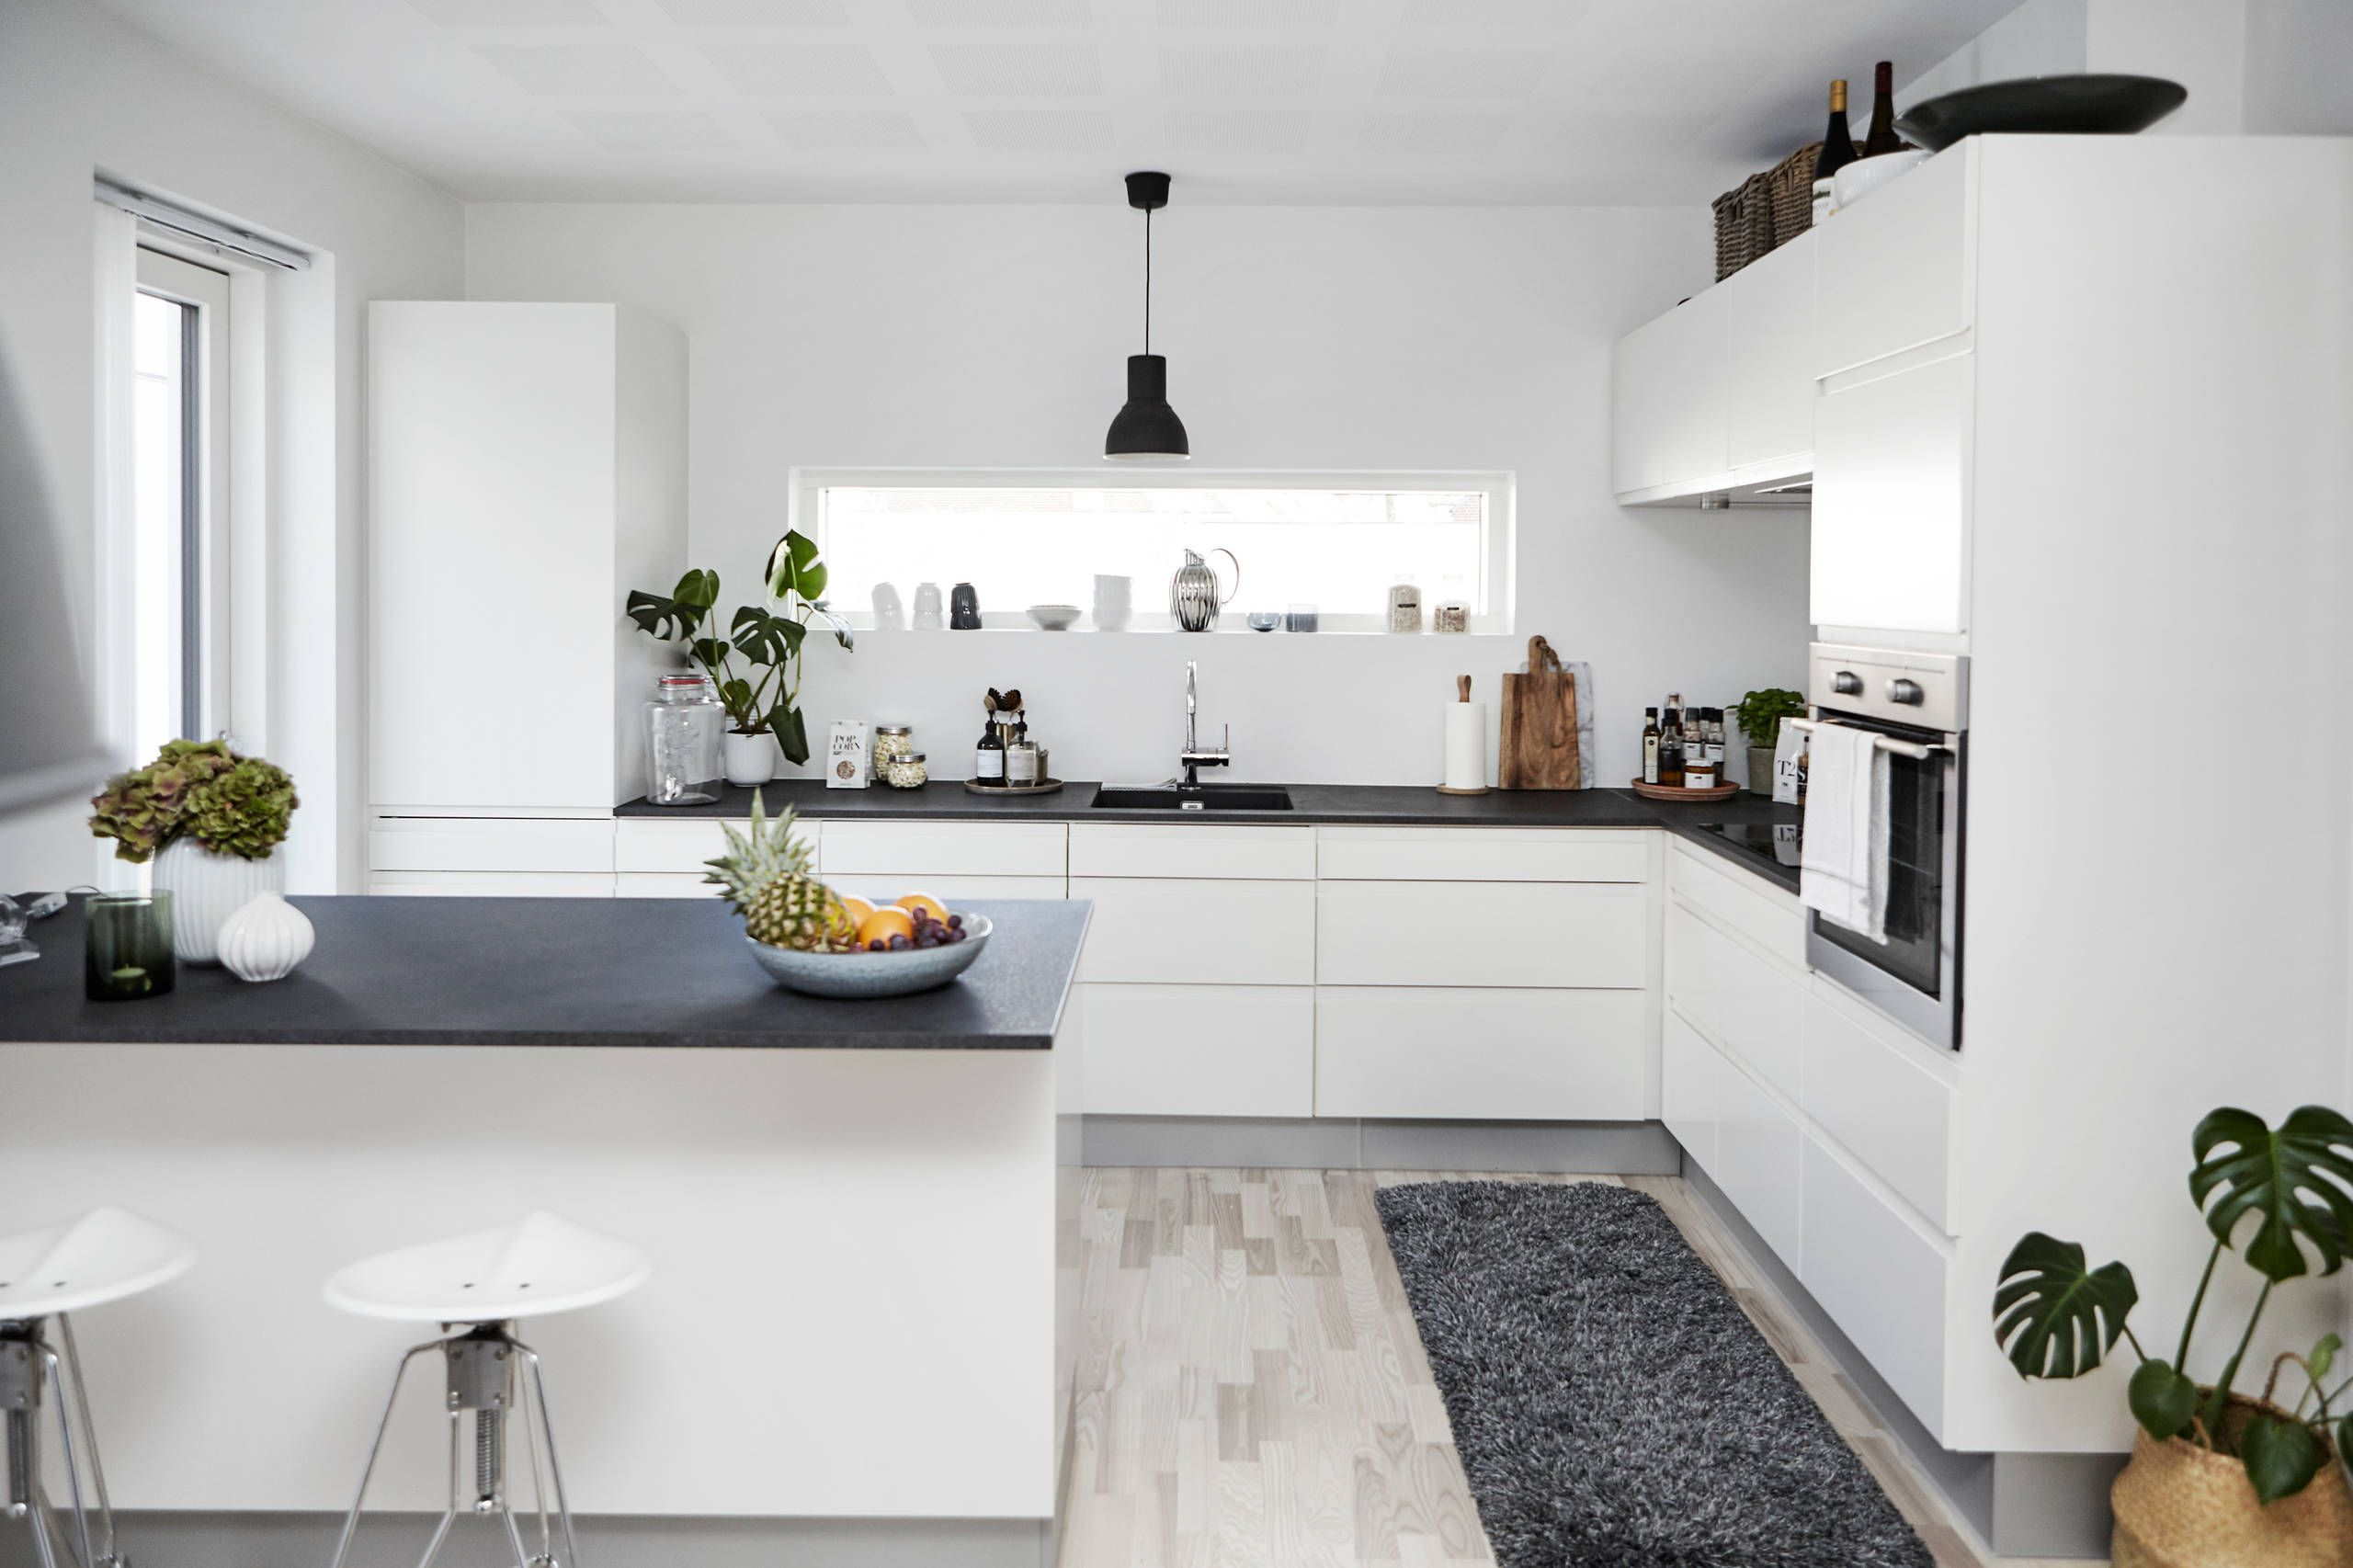 Kitchen Styles Small U Shaped Kitchen Designs New Kitchen Ideas Country Kitchen Designs Contemporary Kitchen Kitchen Layout